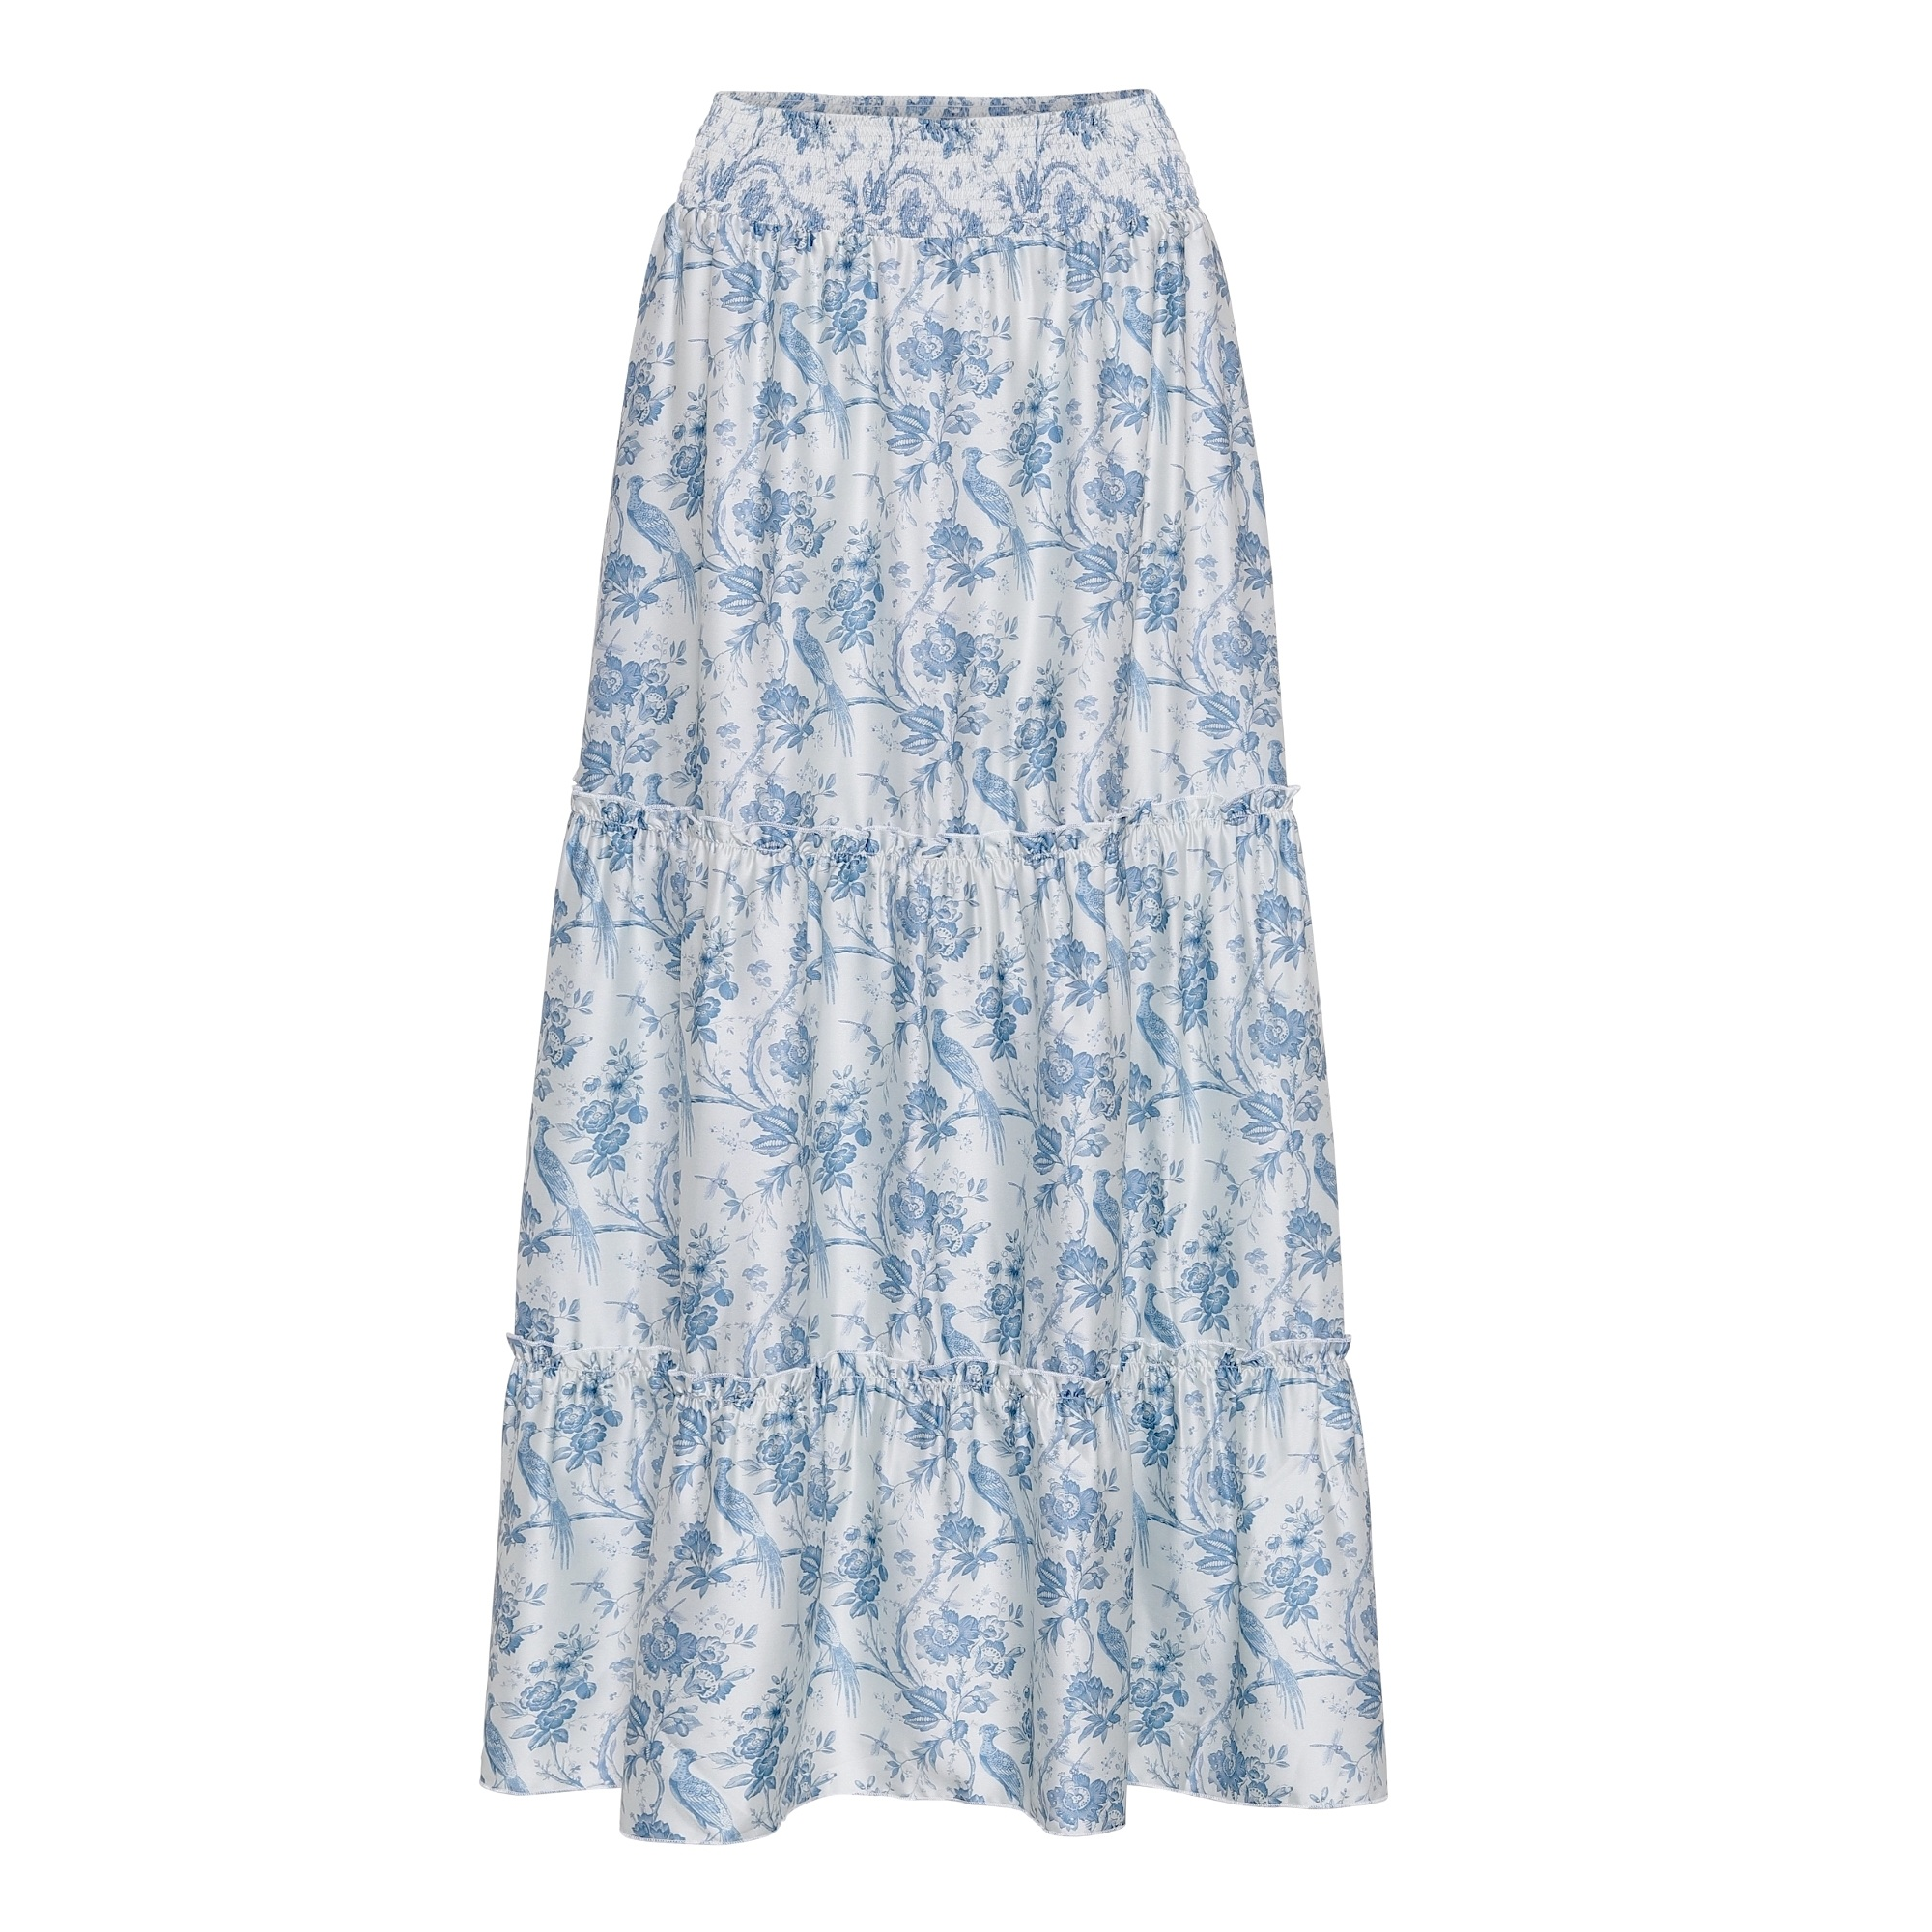 Ruffle-Boheme-Skirt-Provence KARMAMIA IMAGE BY ME